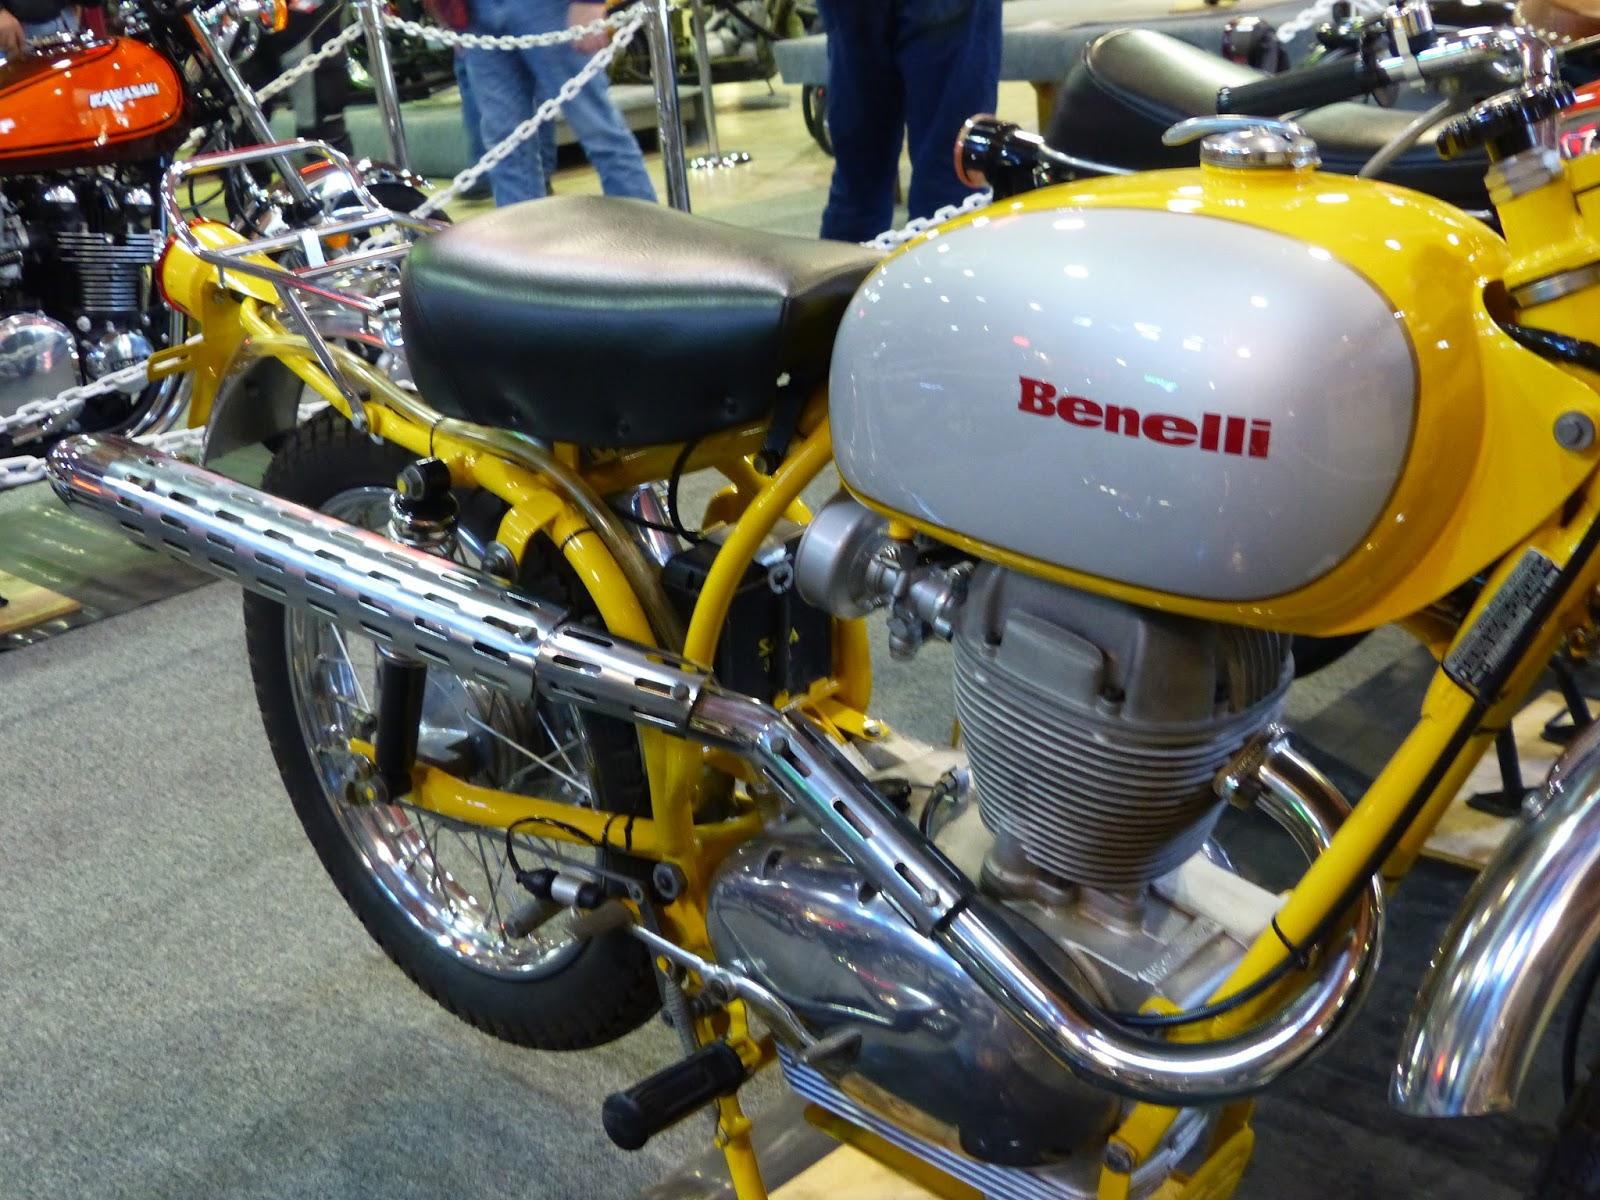 OldMotoDude: 1967 Benelli/Montgomery Wards 250 Scrambler